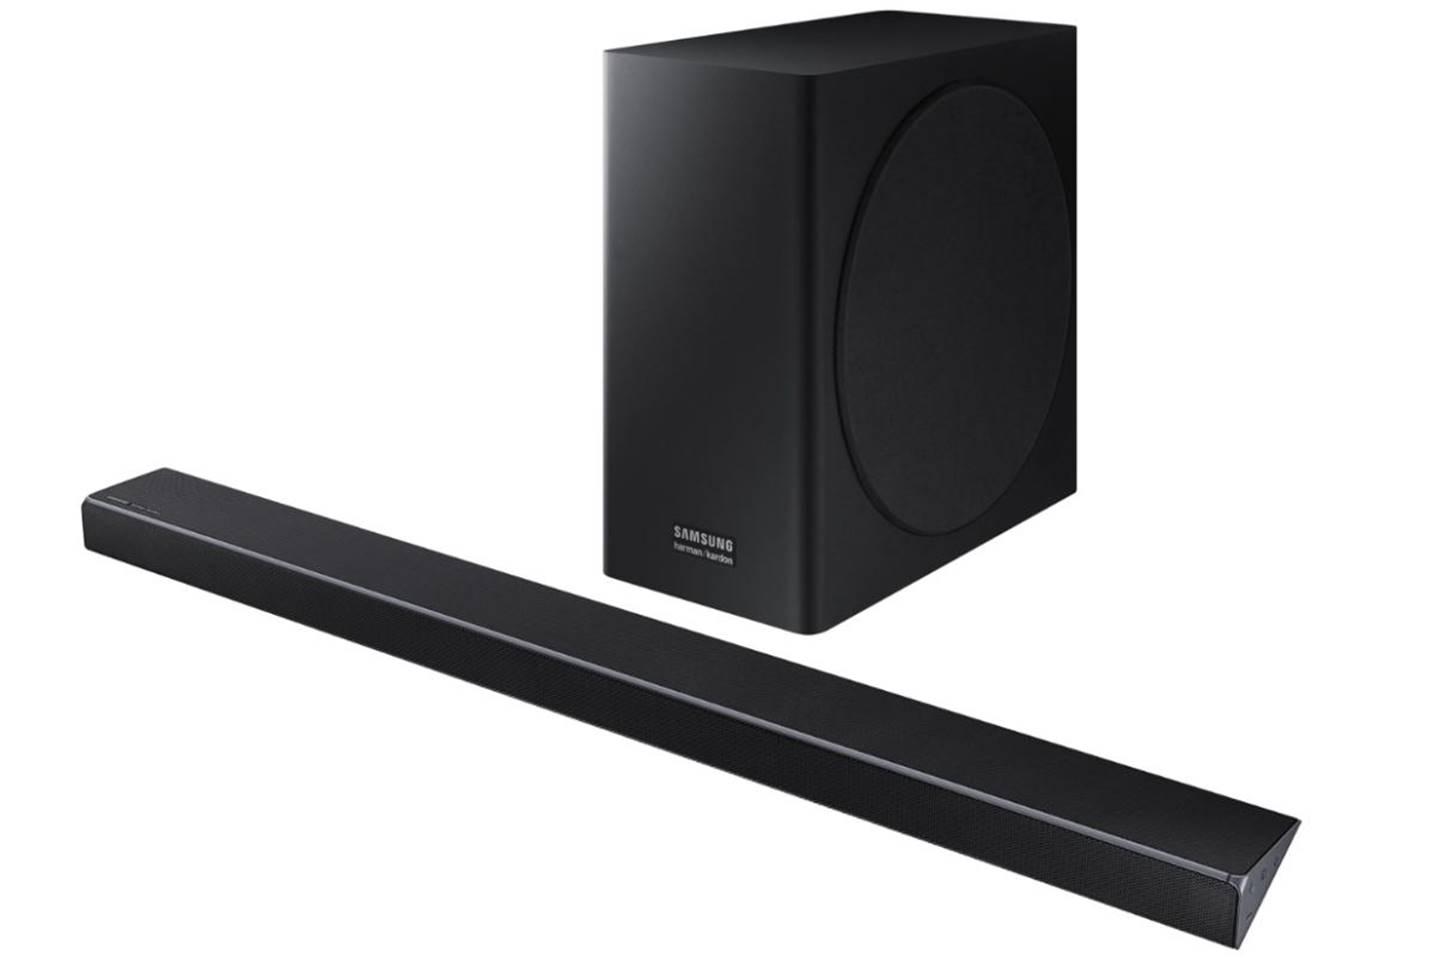 Samsung Bluetooth Smart Sound Bar